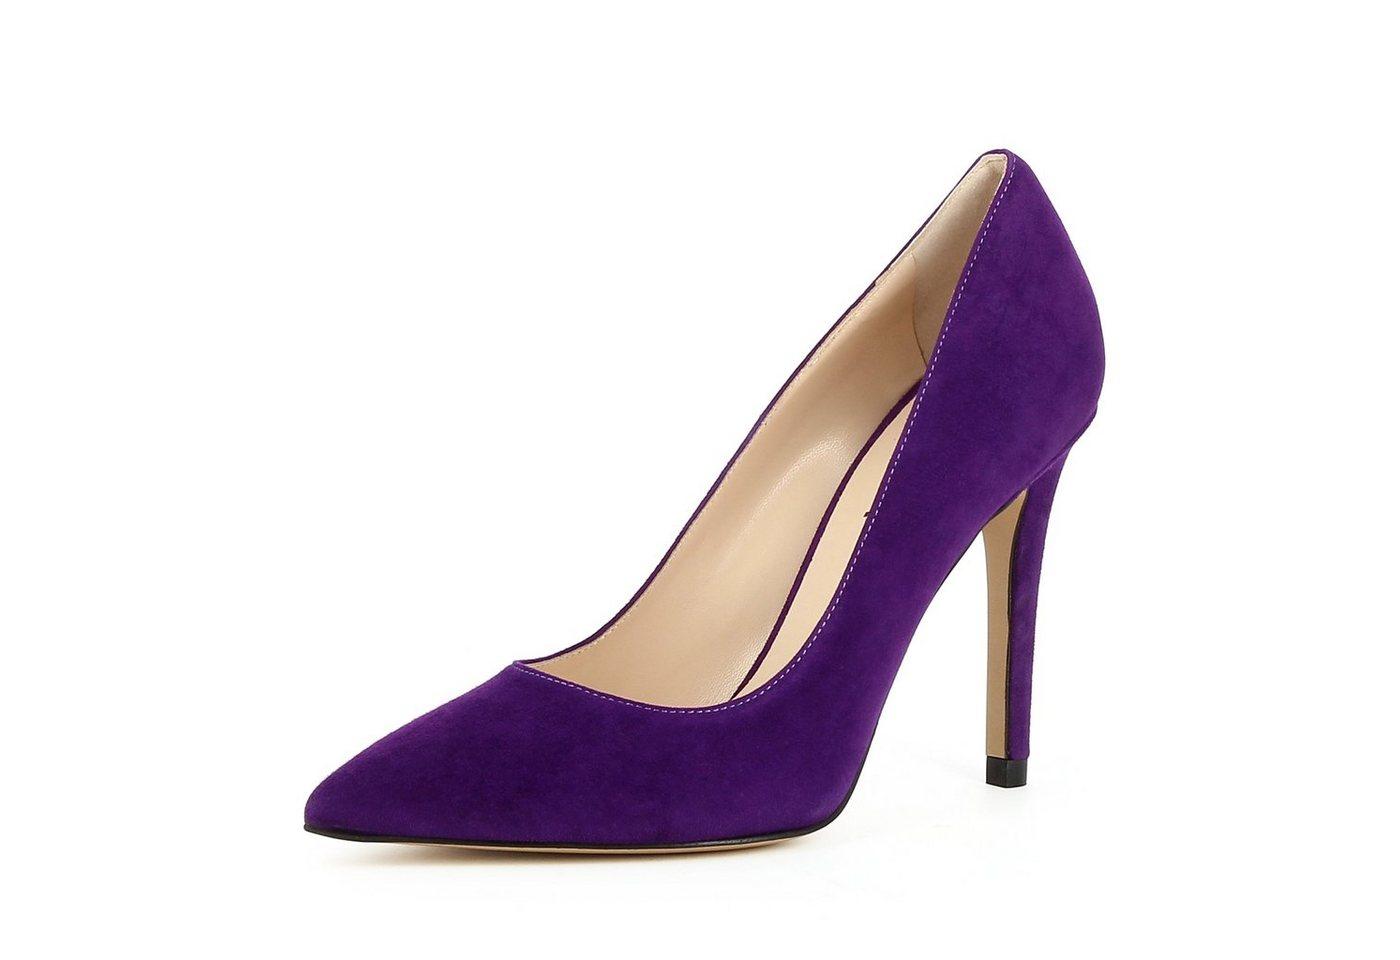 Evita »ALINA« High-Heel-Pumps   Schuhe > High Heels > High Heel Pumps   Lila   Evita